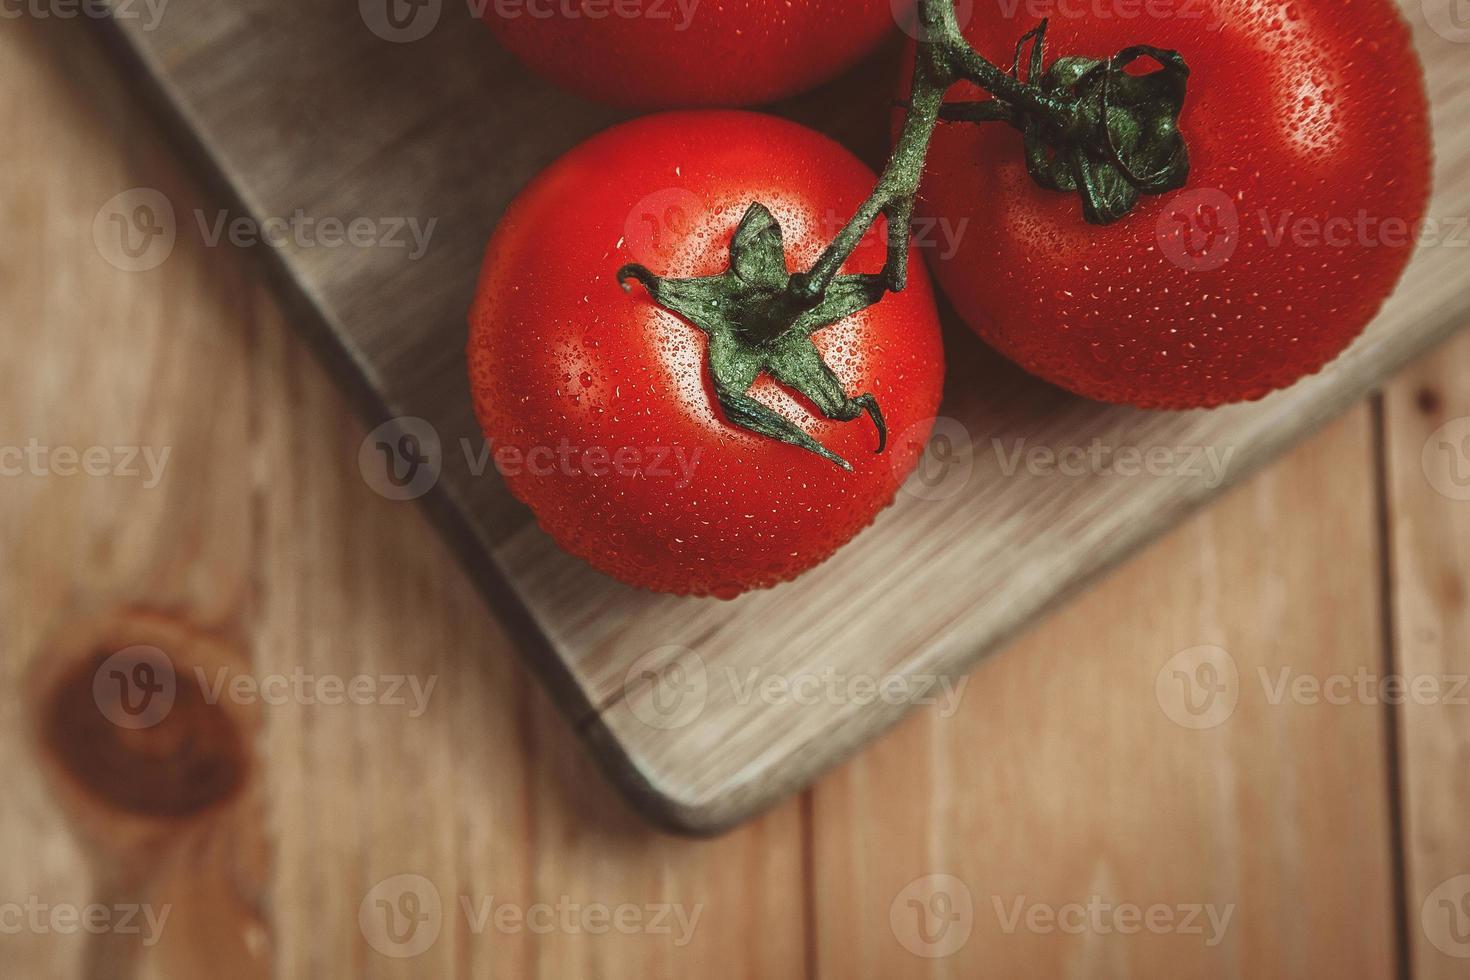 Tomaten auf Schneidebrett foto